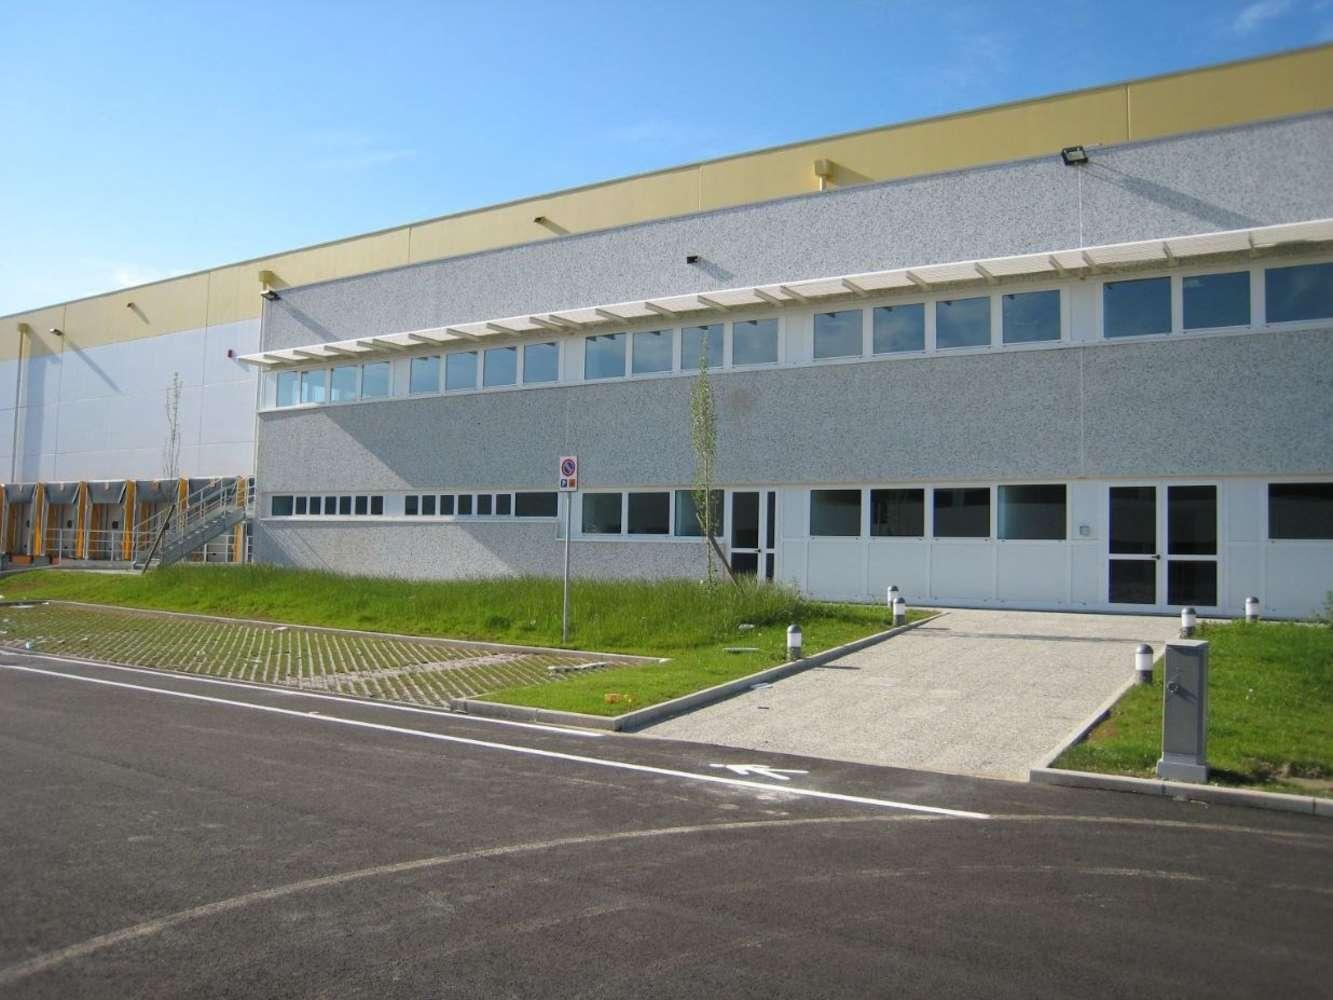 Magazzini industriali e logistici Biandrate (no), 28061 - Biandrate Logistics Park